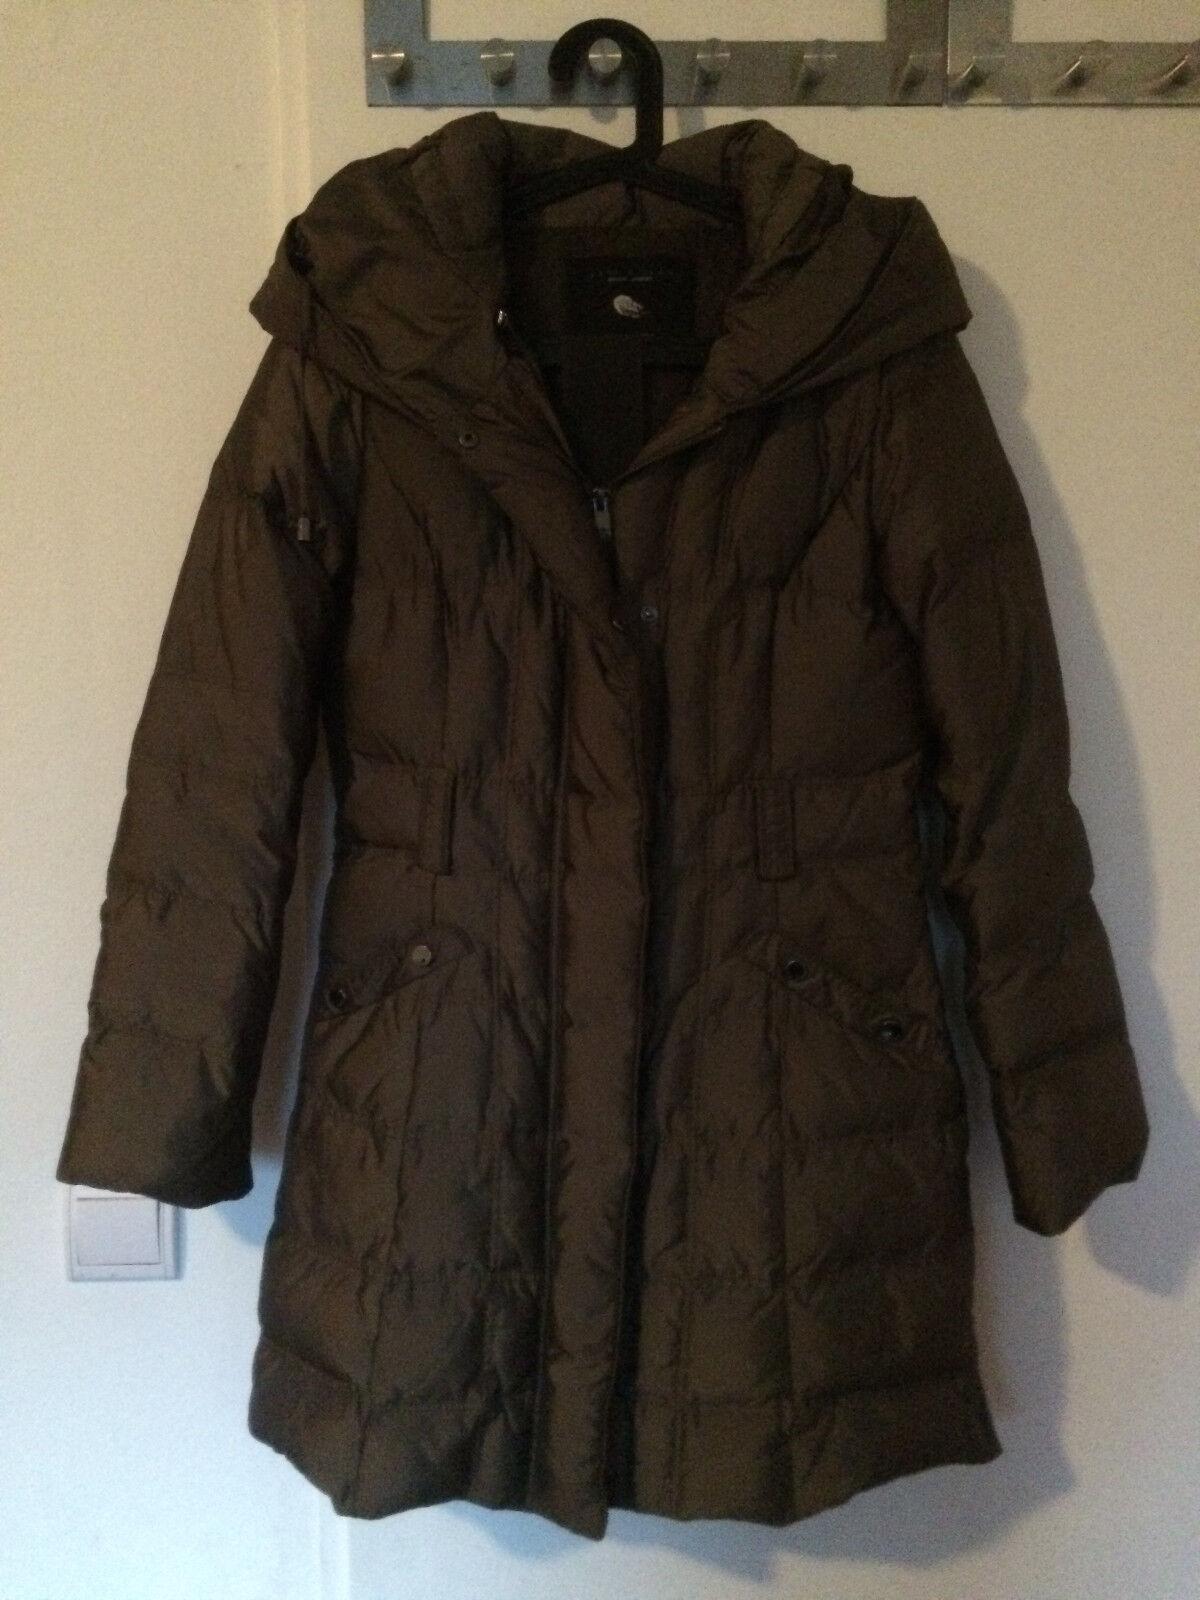 Billig Braun Jacke Zara Daunenjacke S Khaki Winterjacke j4LA5R